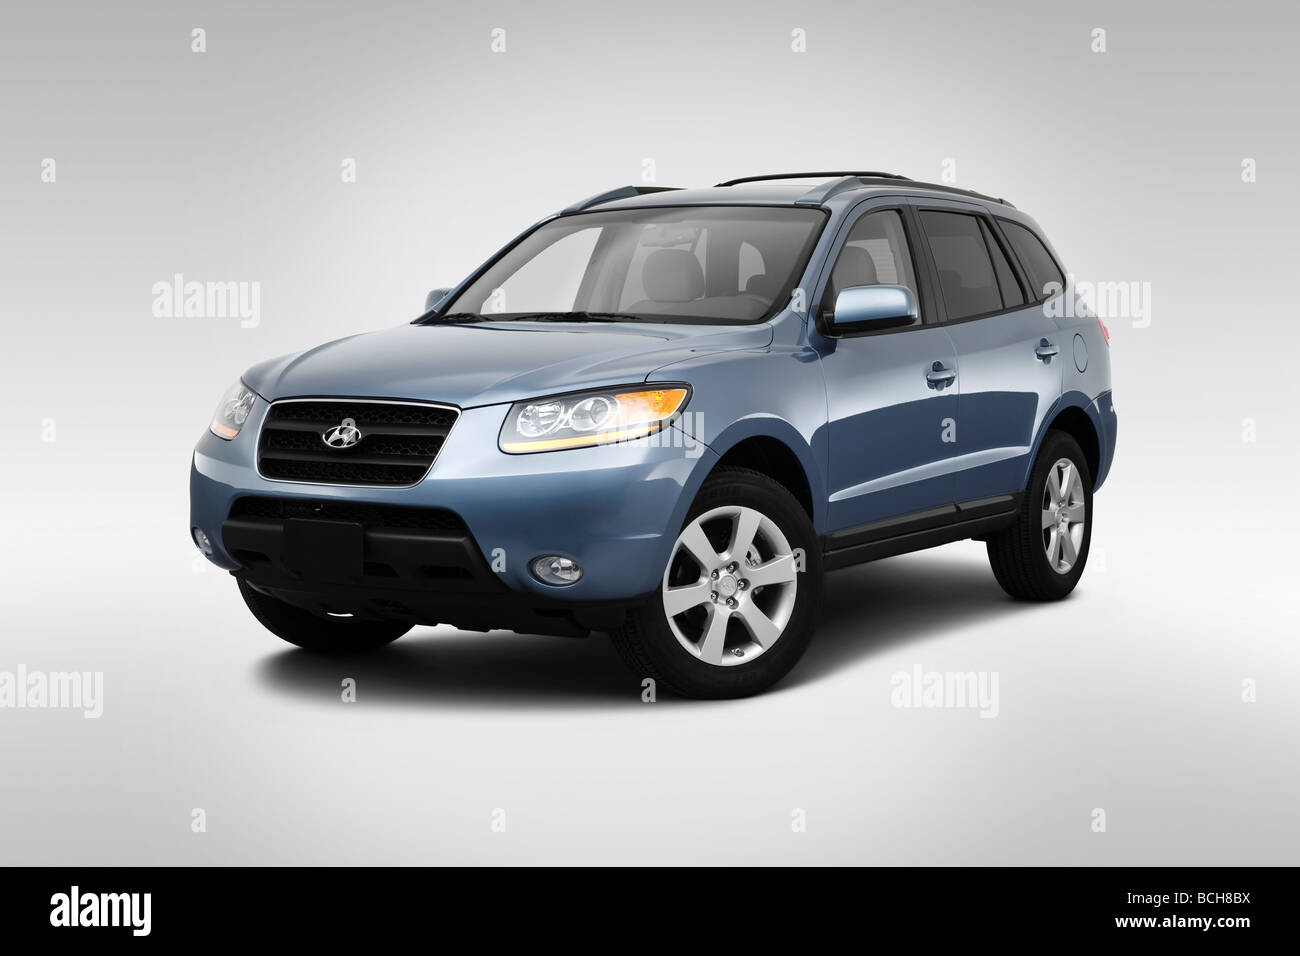 2009 Hyundai Santa Fe SE in Blue - Front angle view - Stock Image